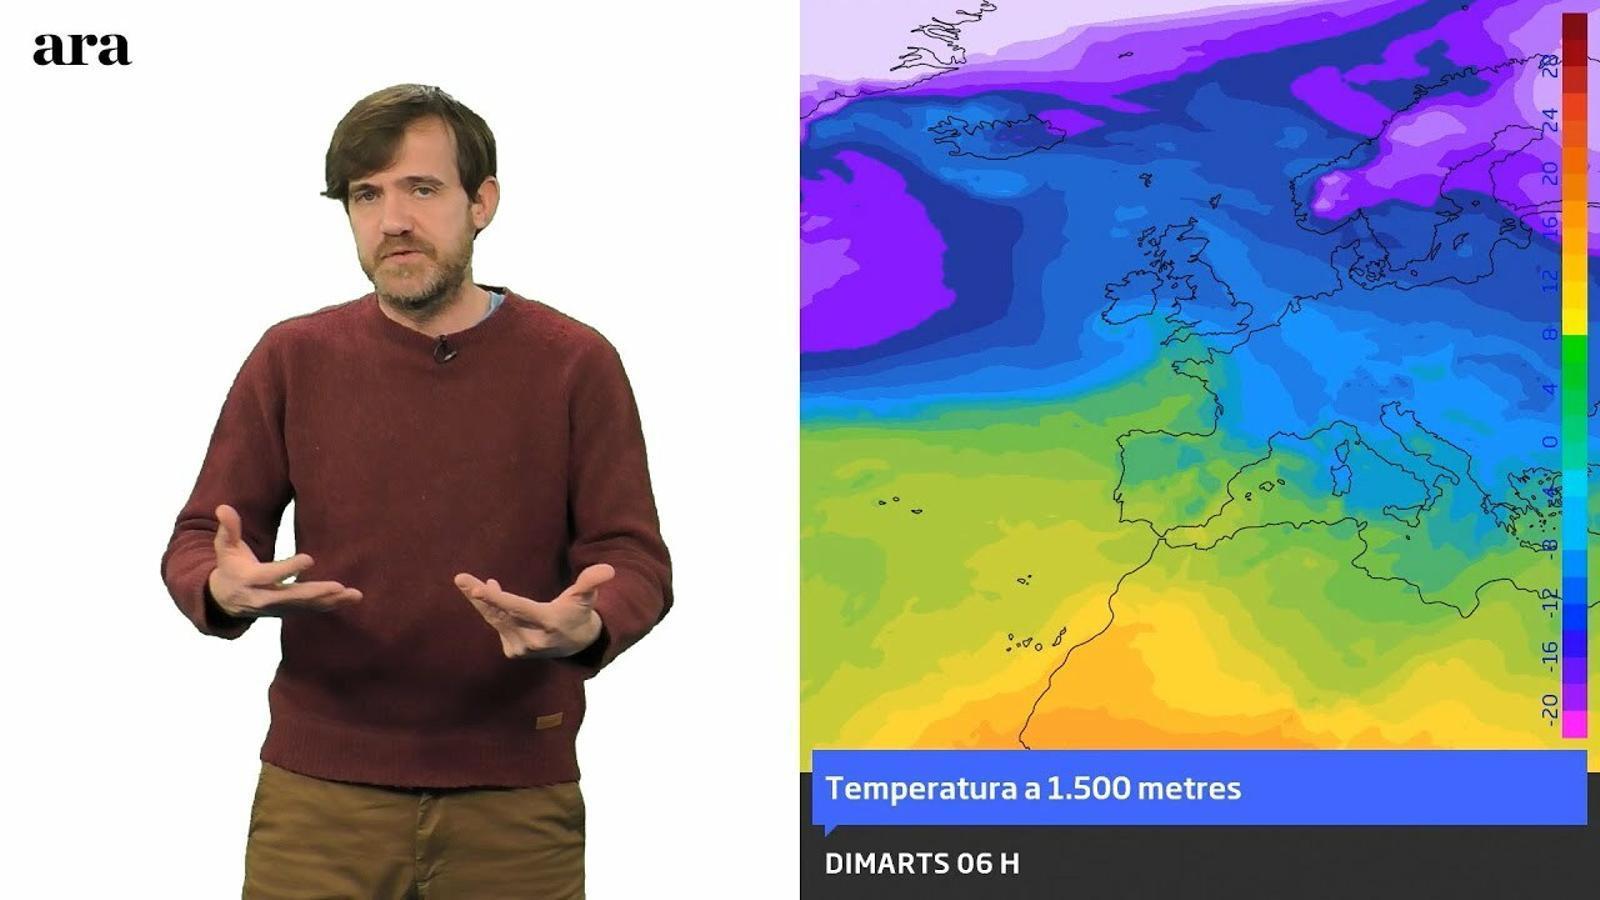 La méteo: entre 3 i 7 graus menys a partir de demà